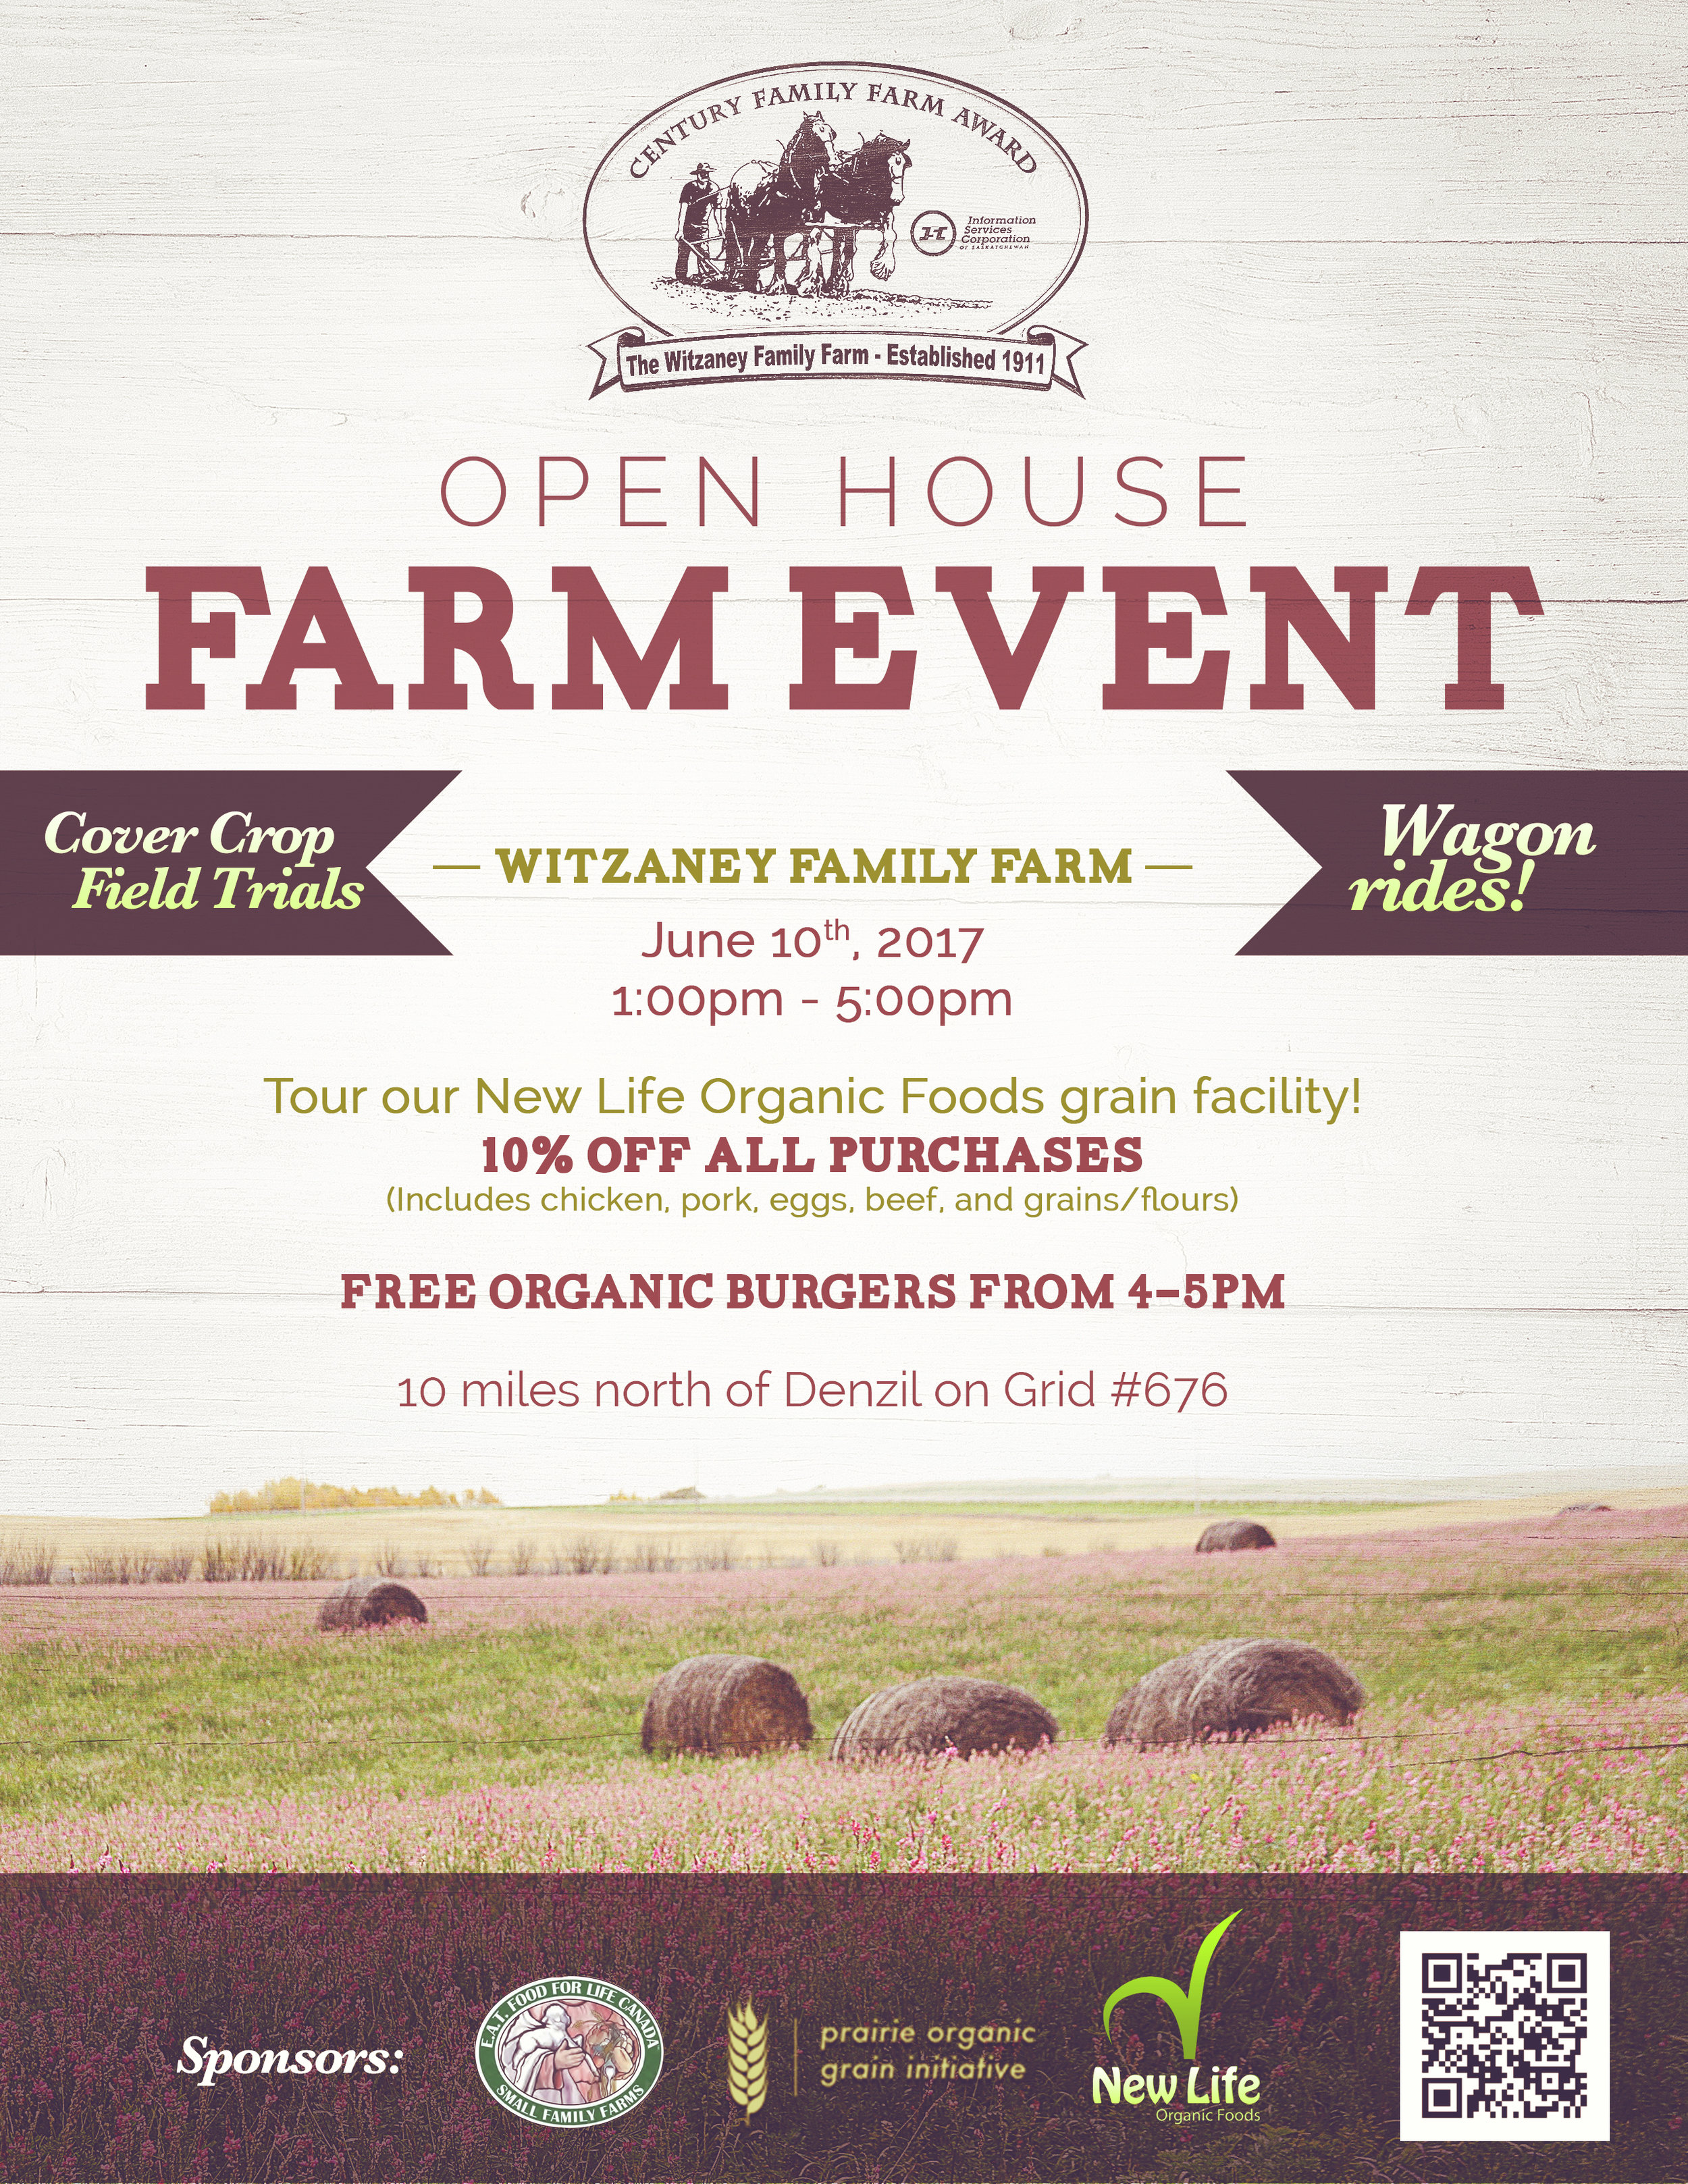 Open House Farm Event 2017